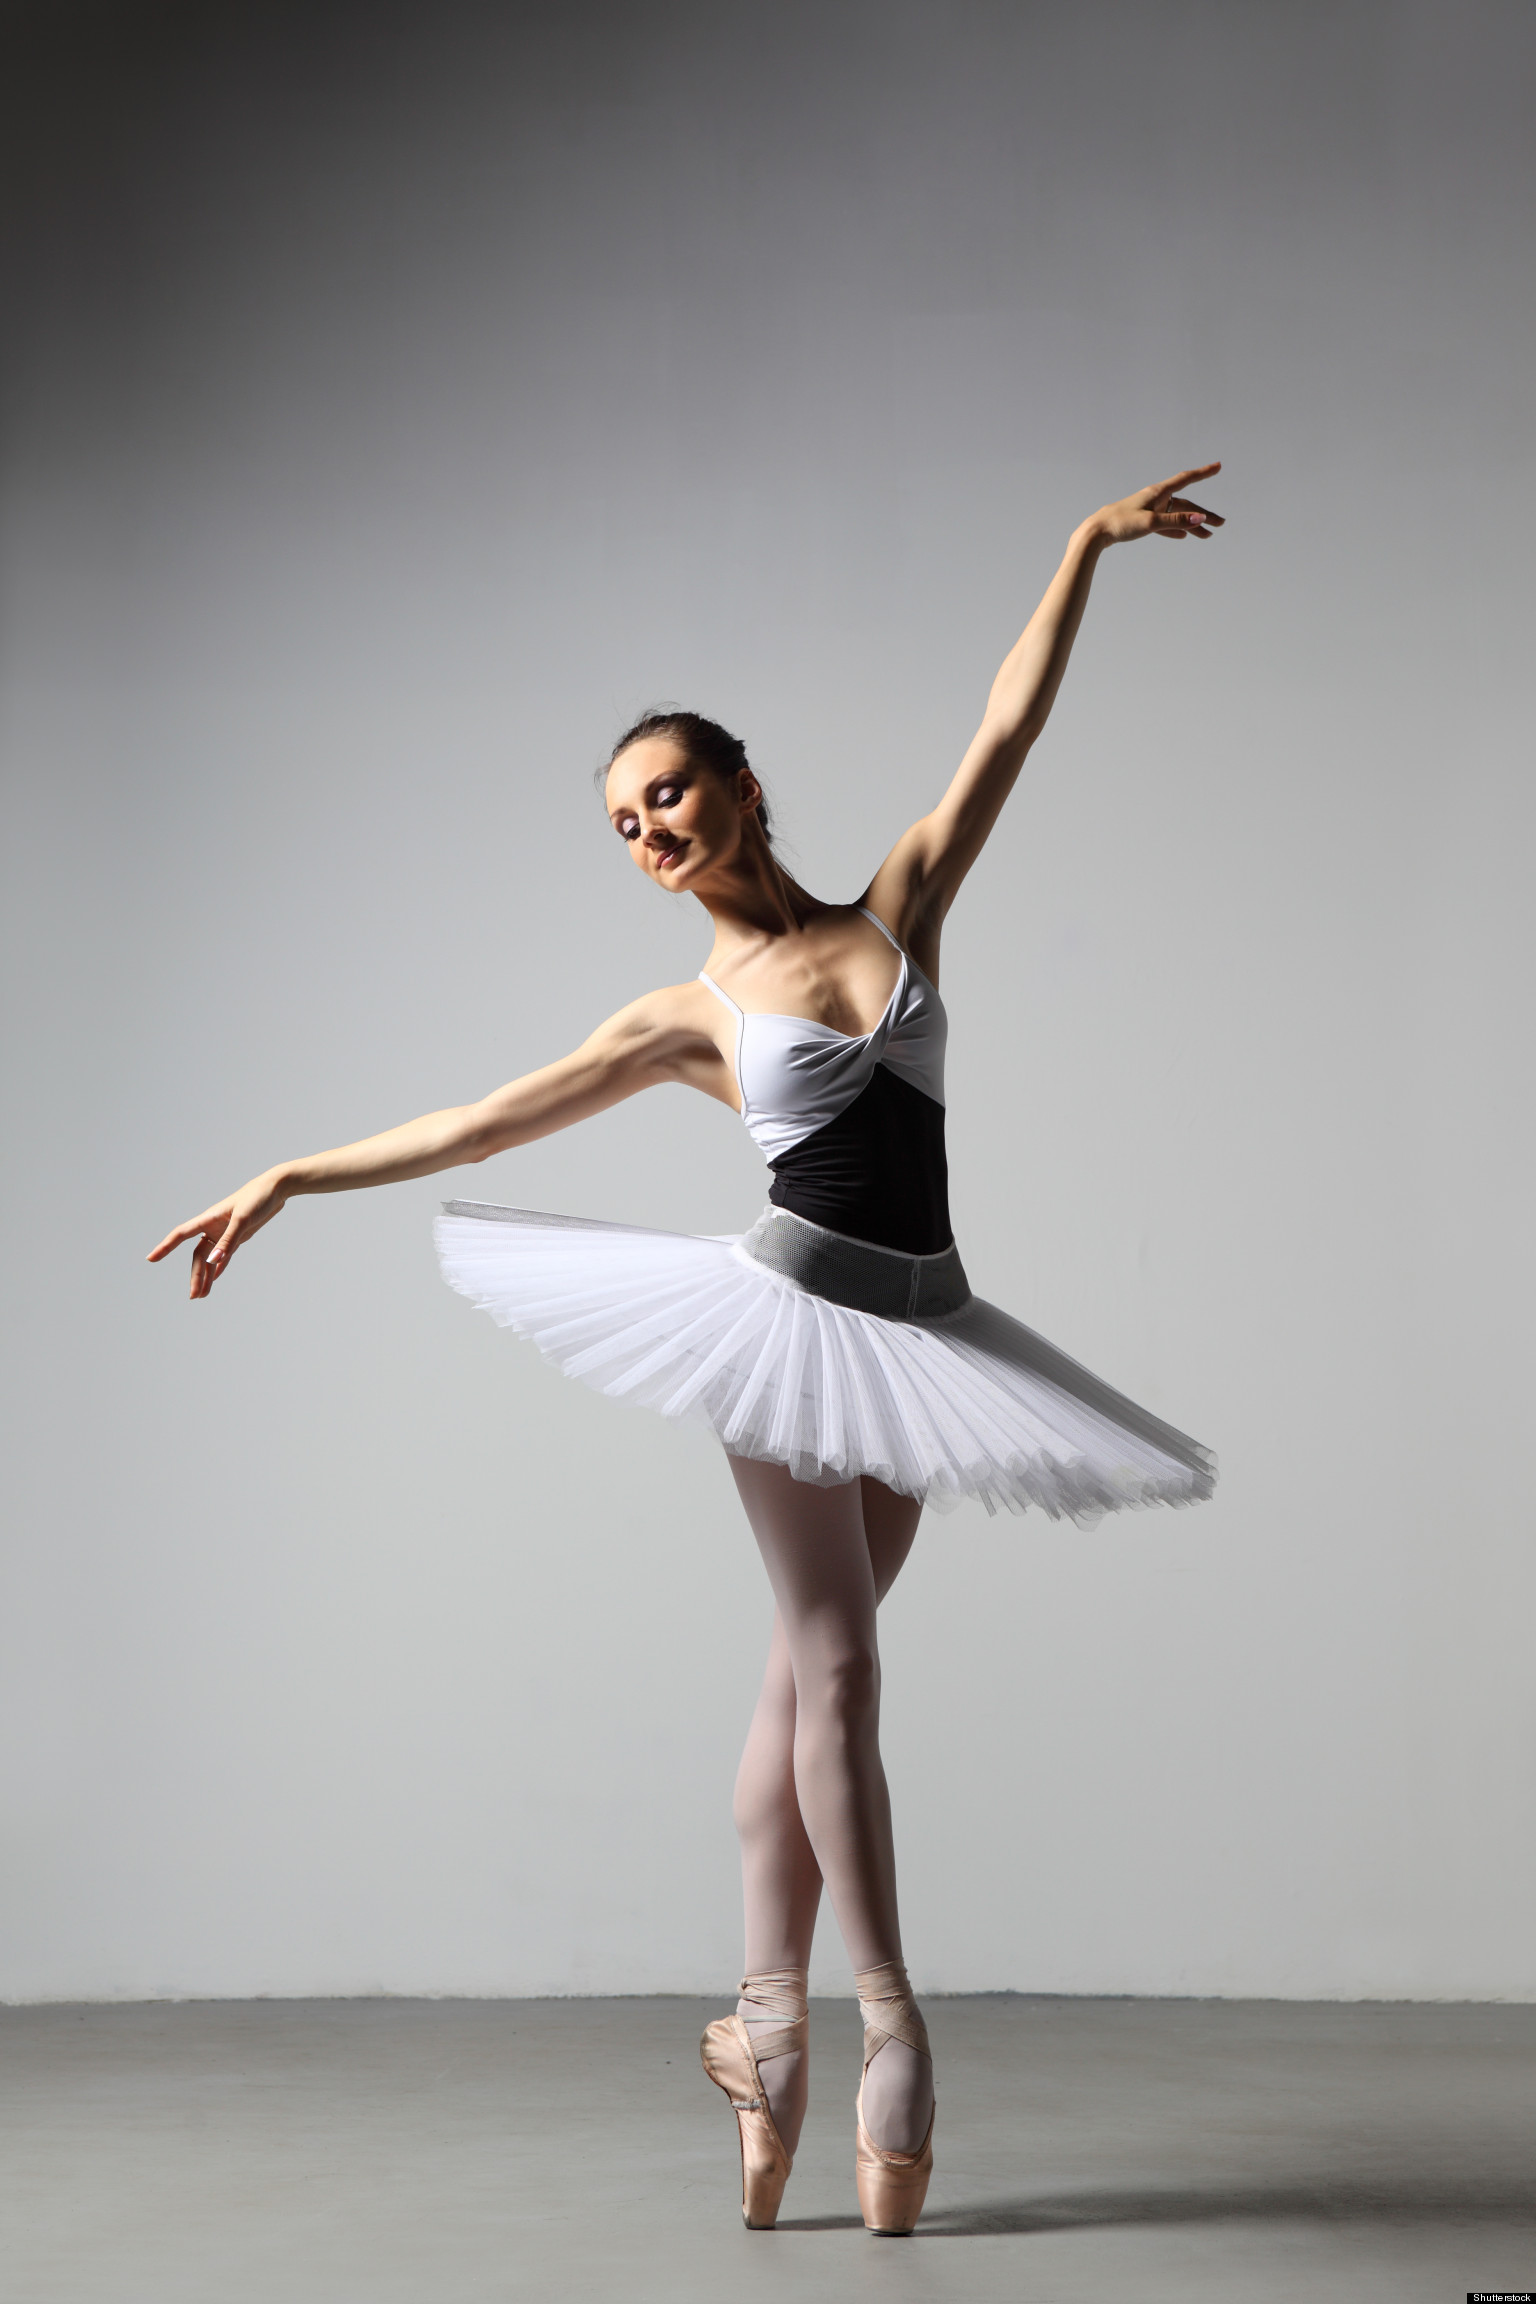 Фото позиций балерин 21 фотография